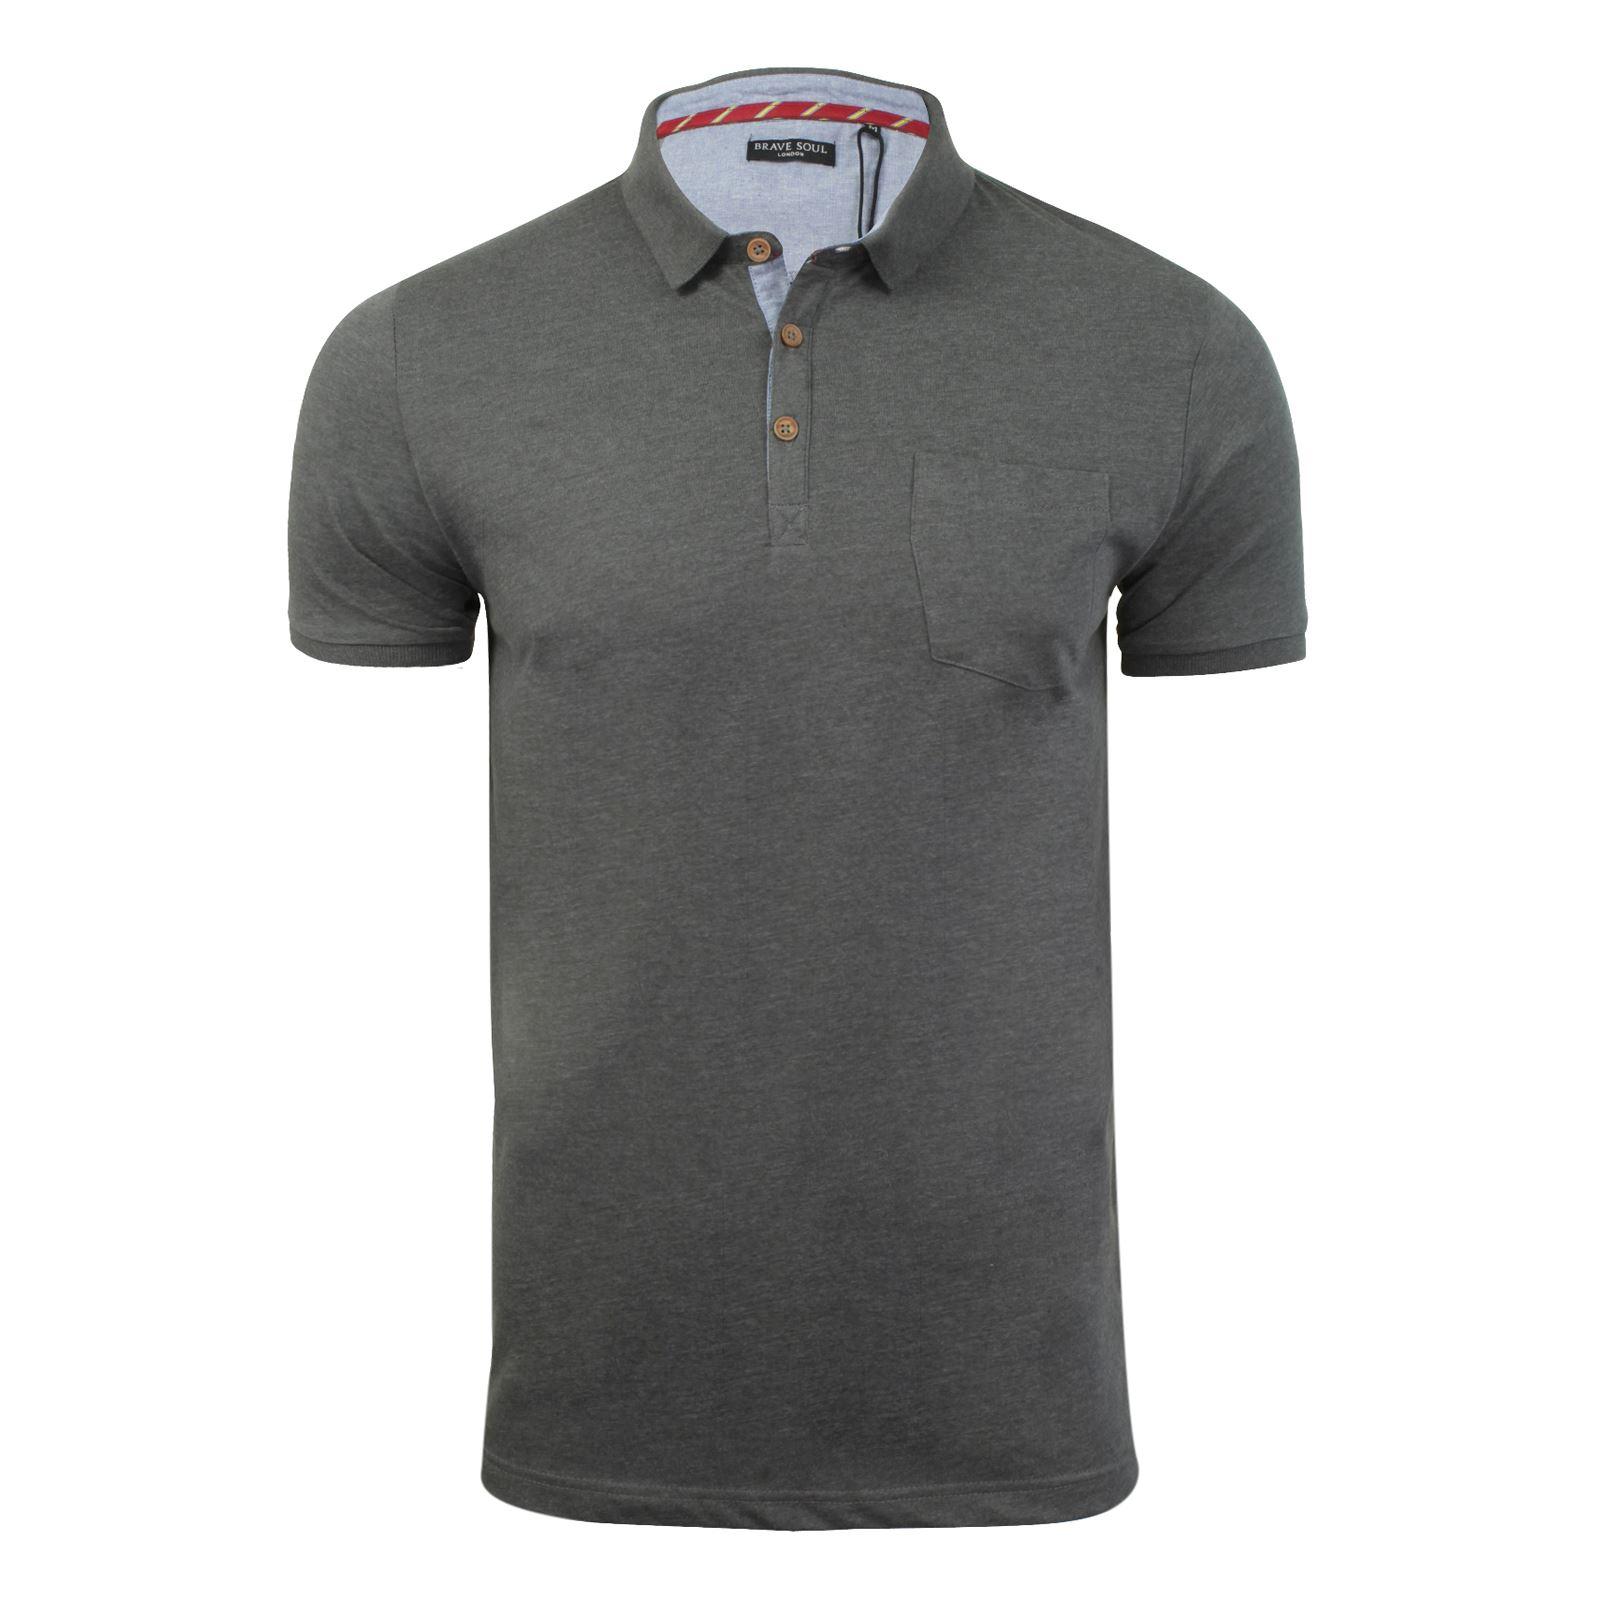 Para-Hombre-Polo-T-Shirt-Alma-valiente-Glover-Algodon-Con-Cuello-Y-Manga-Corta-Casual-Top miniatura 81